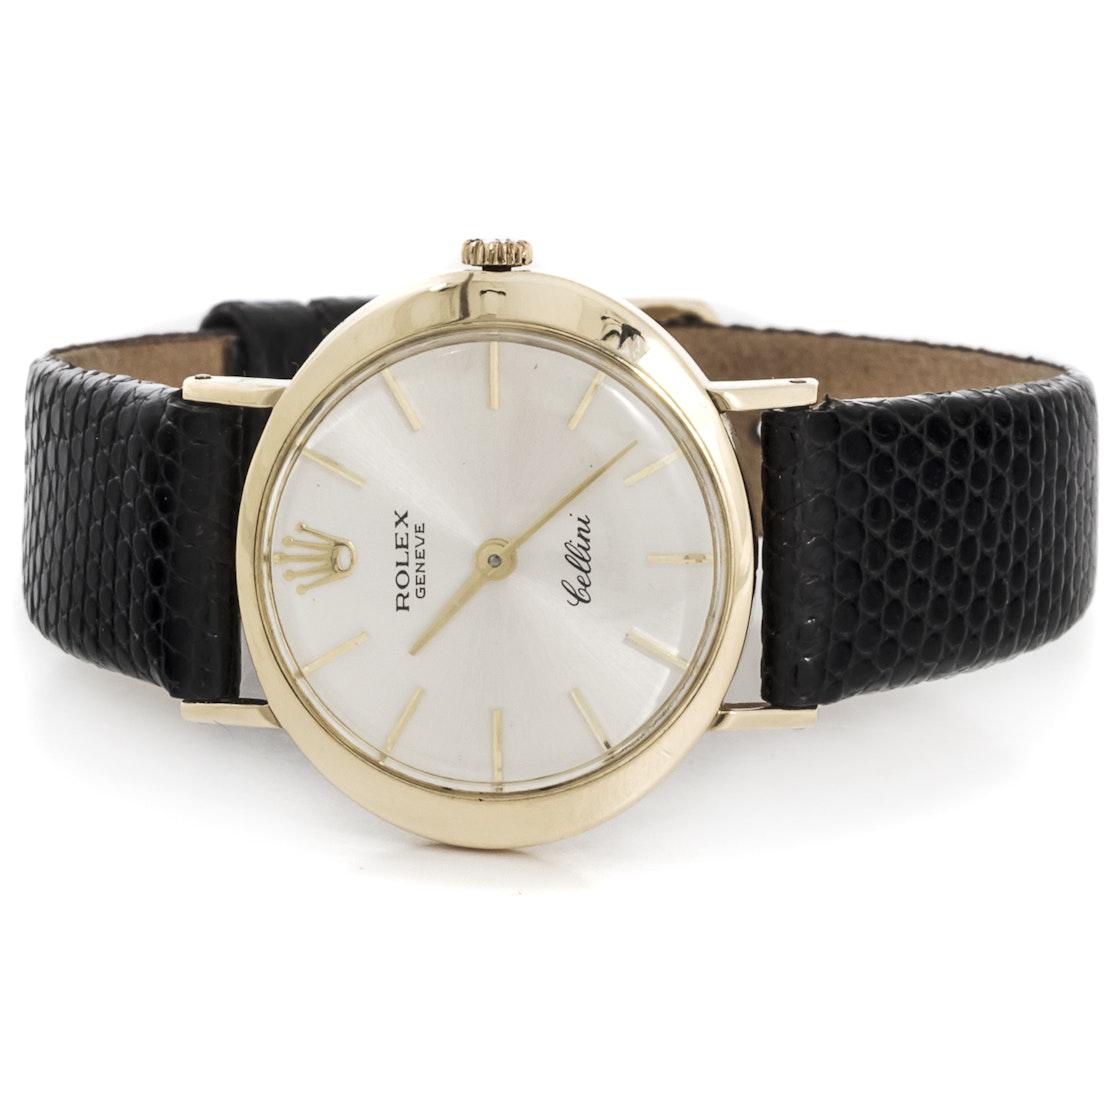 Rolex Cellini 3653